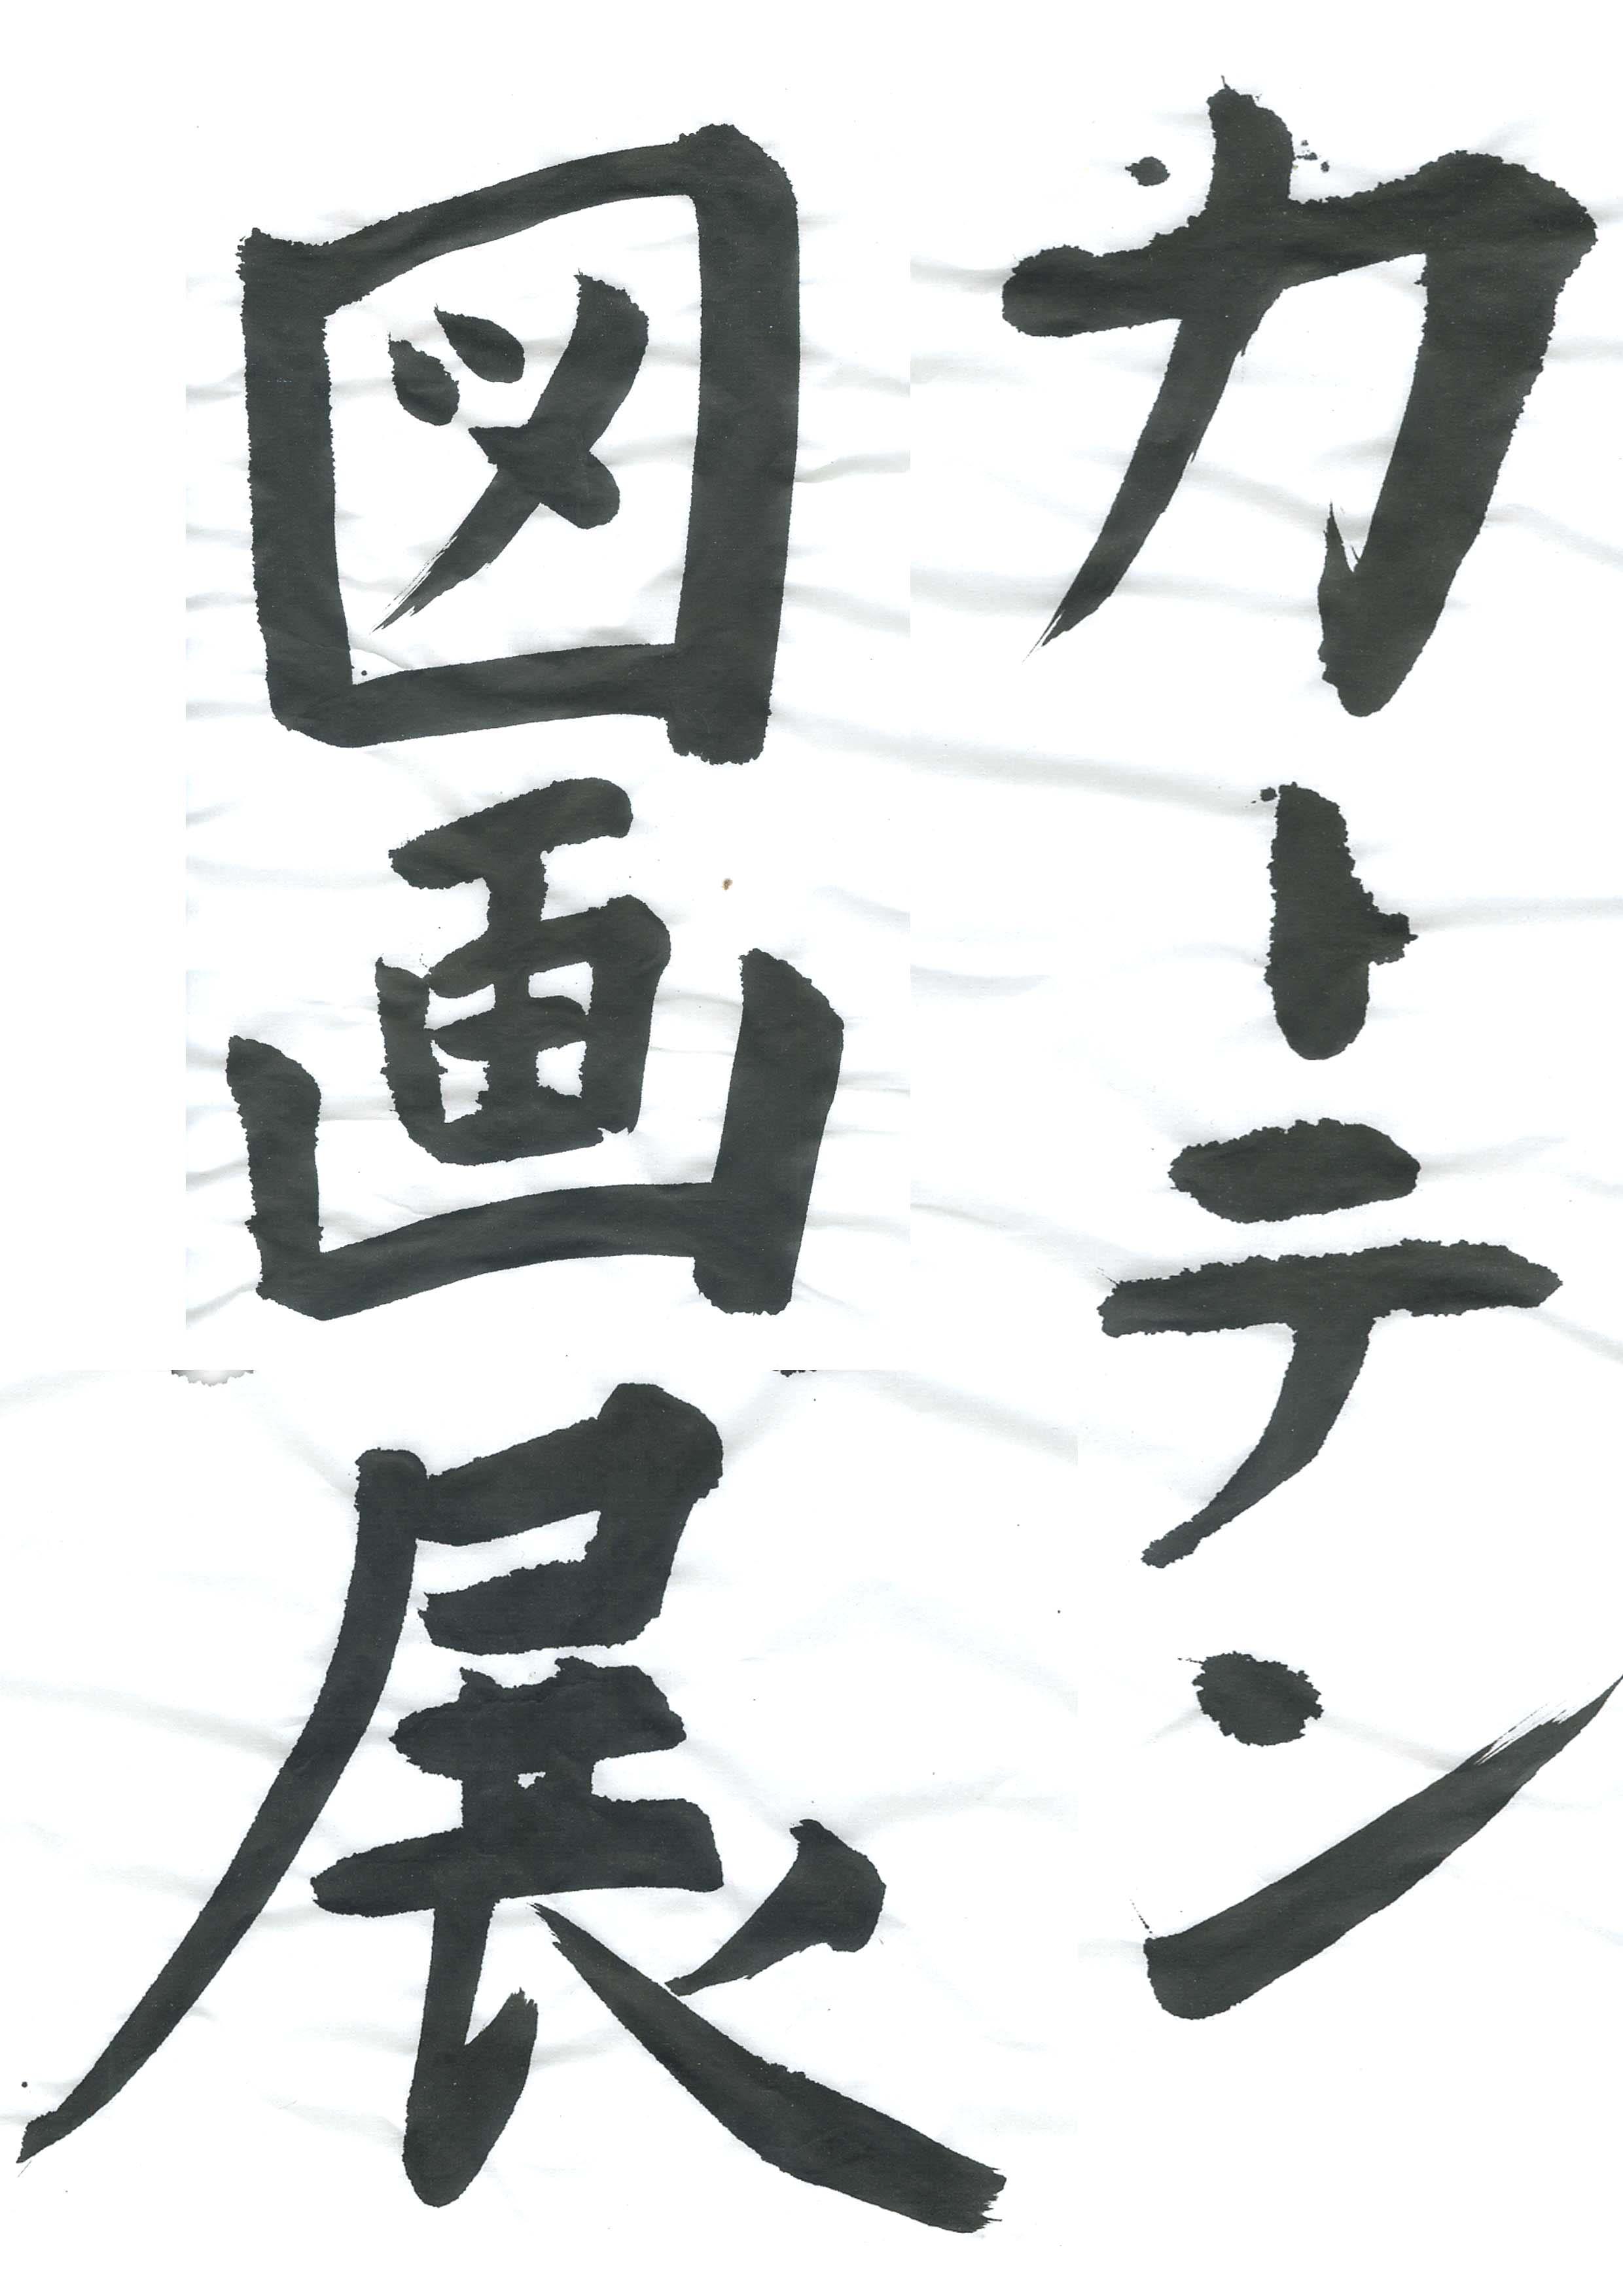 c0136932_0954.jpg